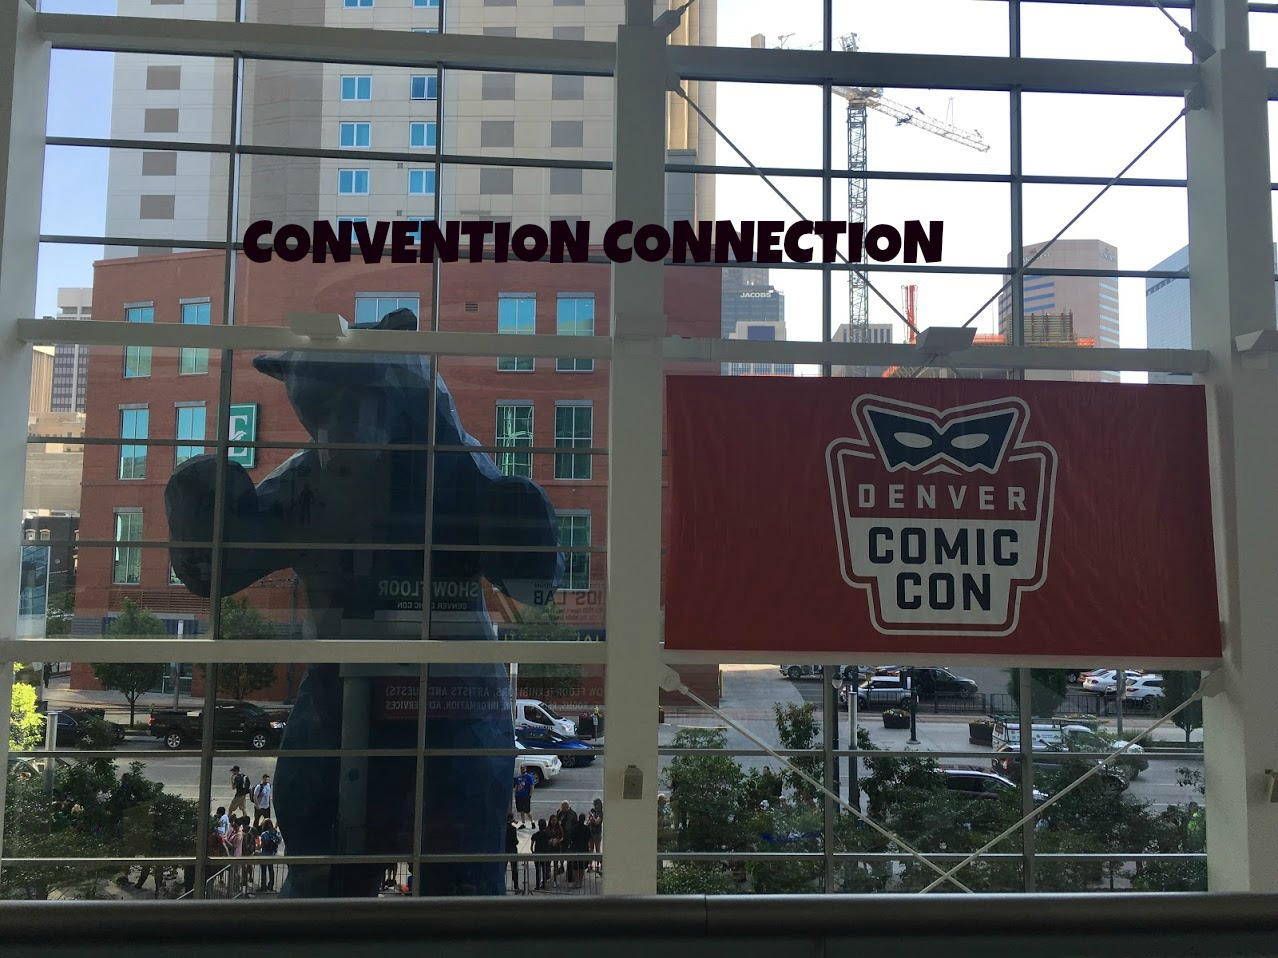 Denver Comic Con.jpg